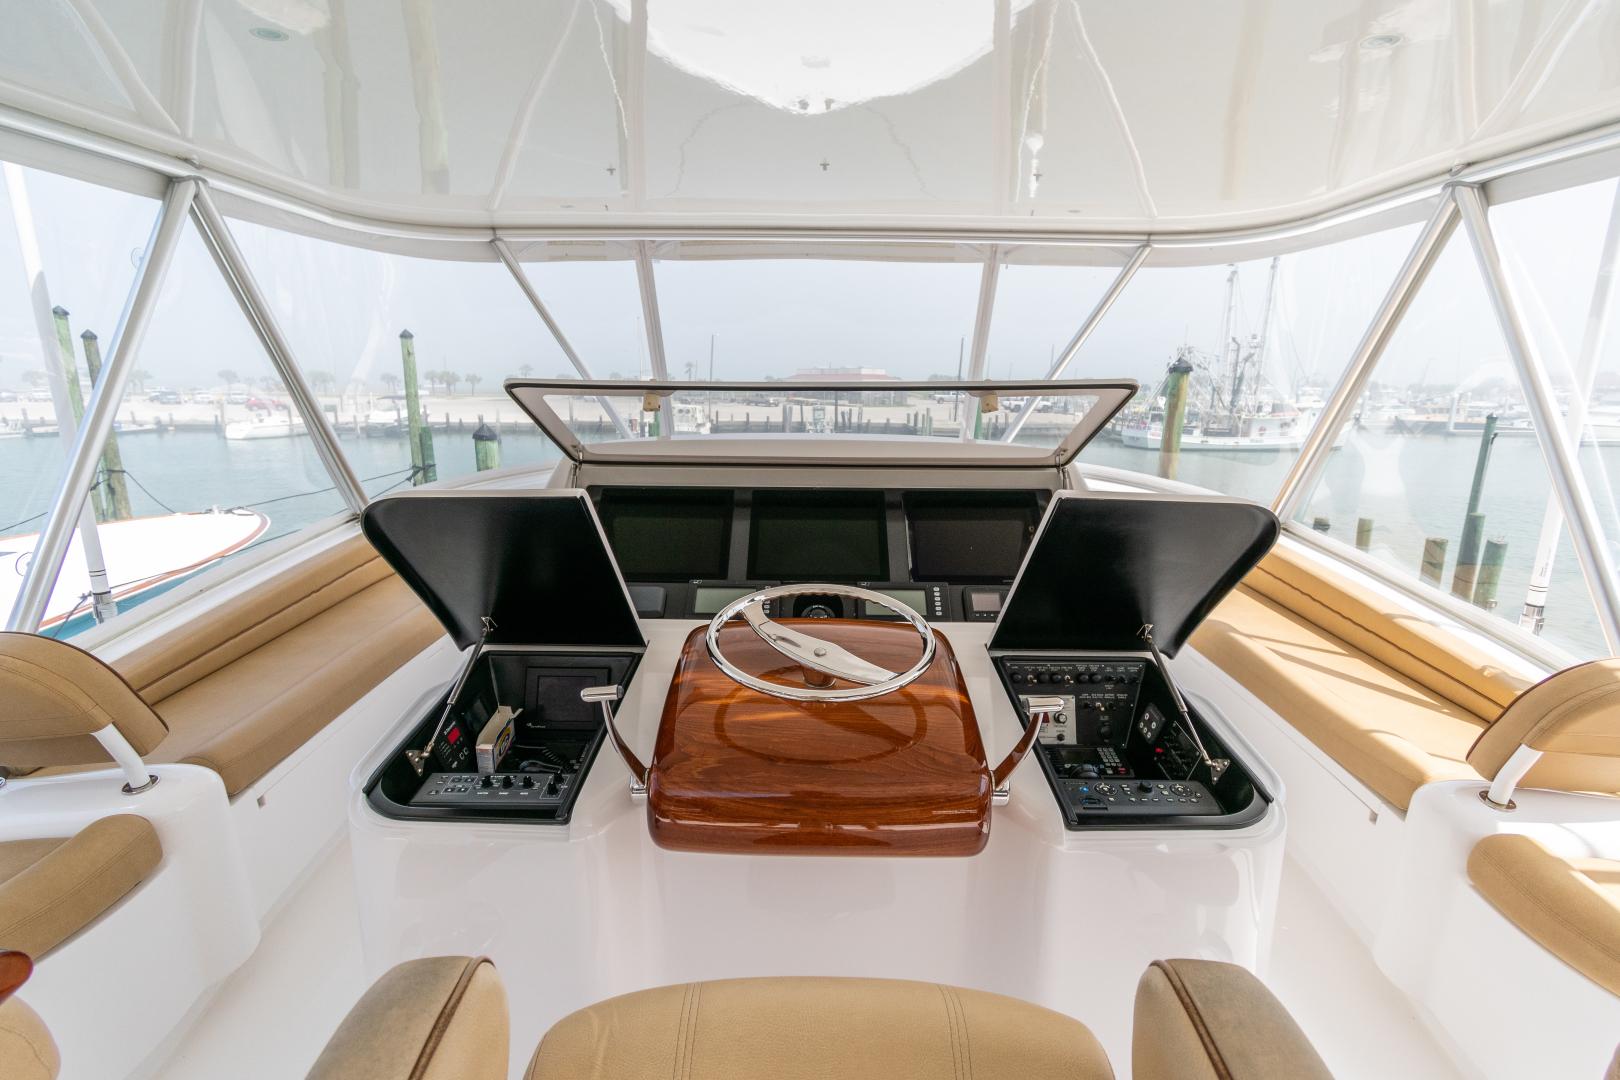 Viking-70 Convertible 2014-Load N Go Port Aransas-Texas-United States-2014 70 Viking Load N Go Helm (2)-1380598 | Thumbnail